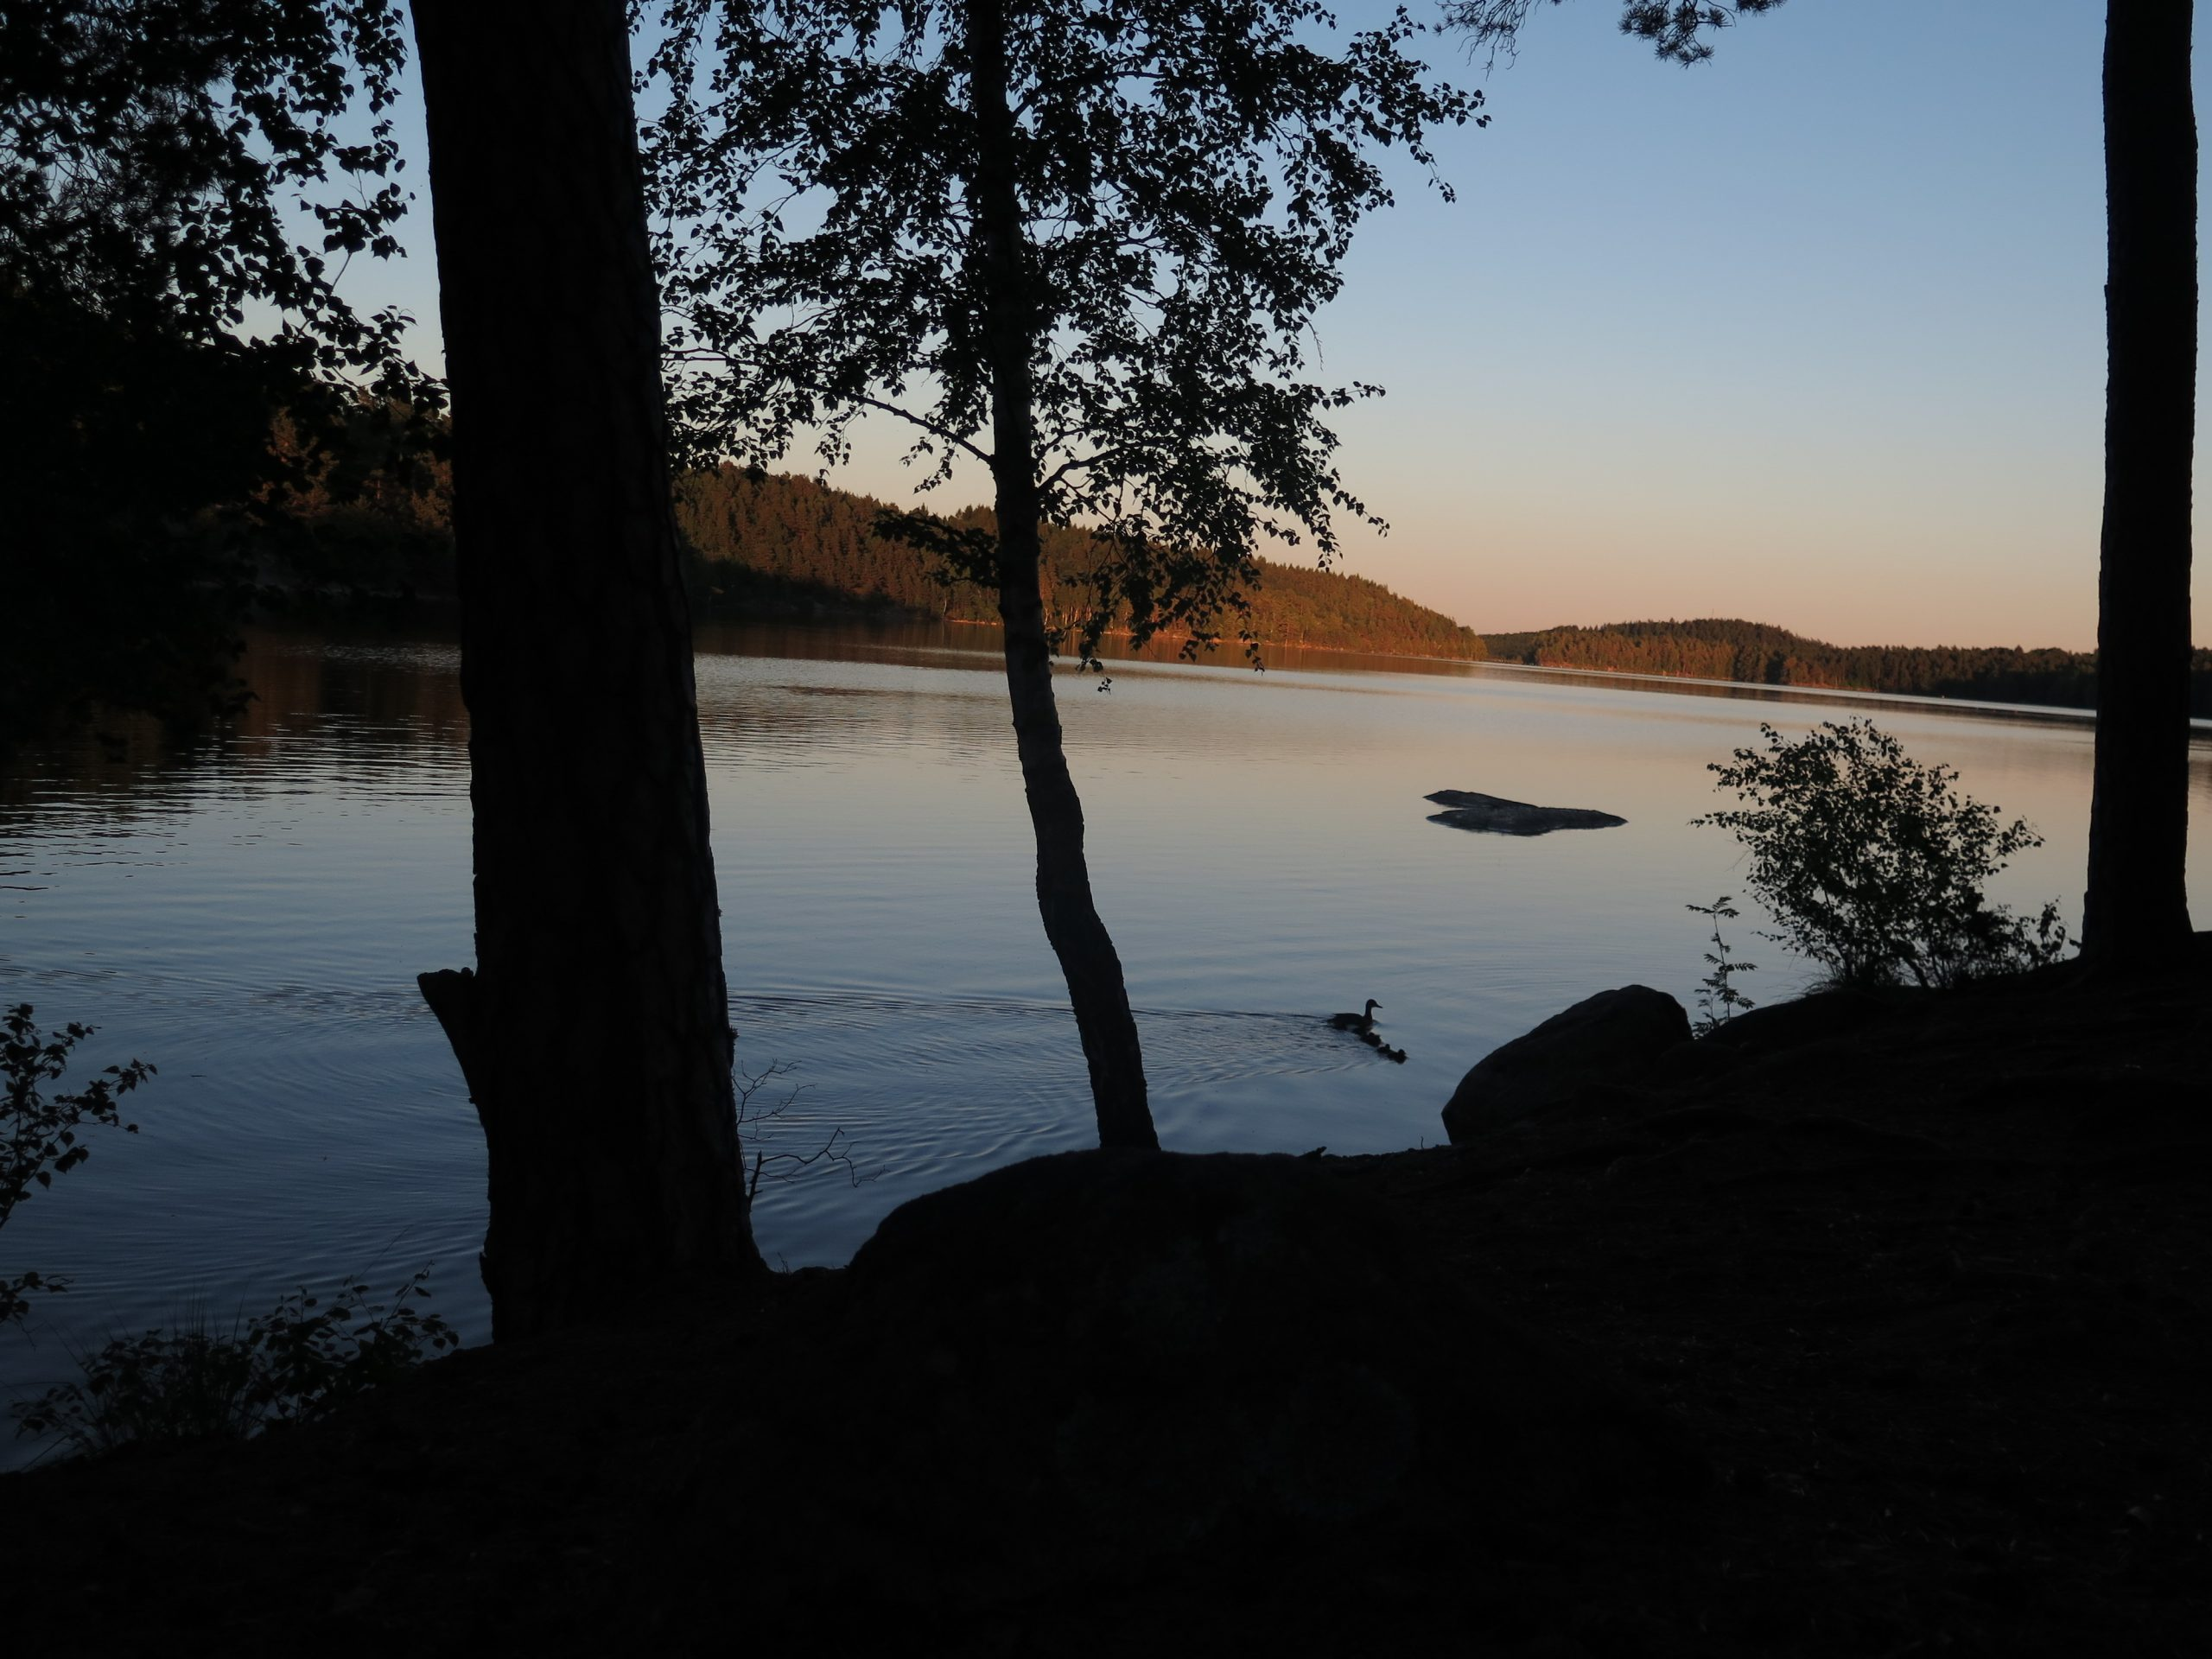 Delsjön lake in the evening